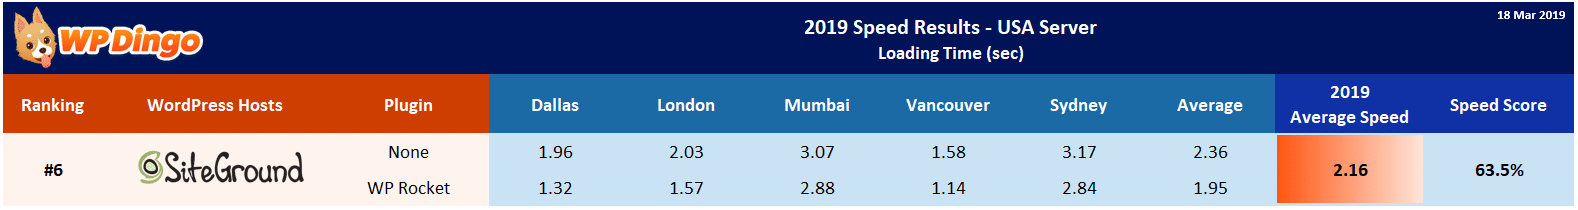 2019 SiteGround Speed Table - USA Server